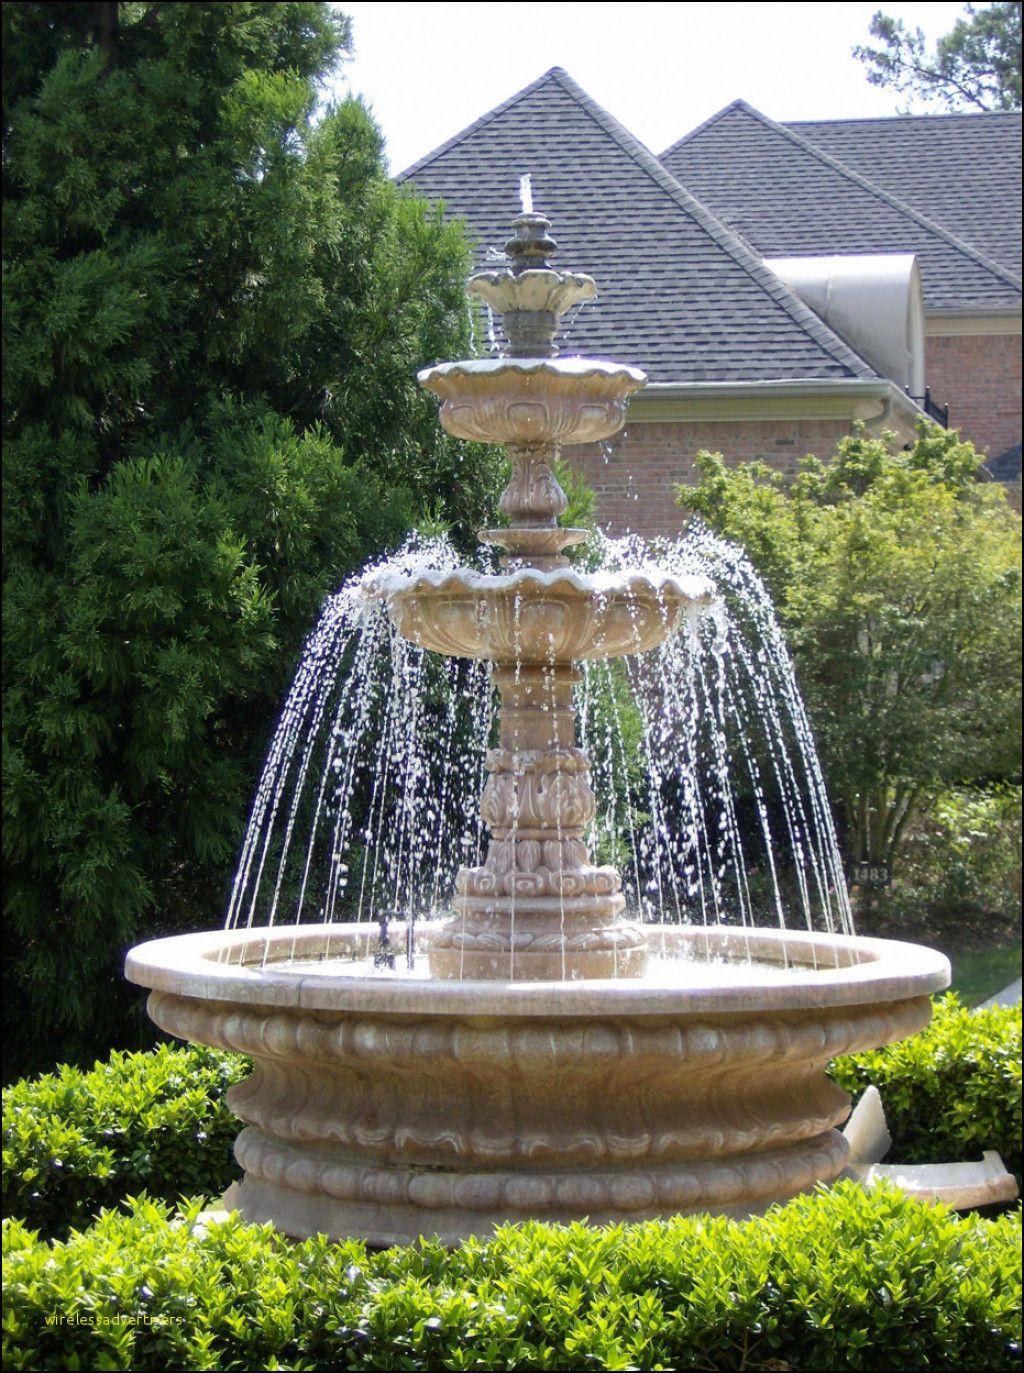 23 Impressive Water Fountain Ideas For Your Spring Garden Intdsg Water Fountains Outdoor Fountains Outdoor Water Fountain Design Modern outdoor water fountain canada